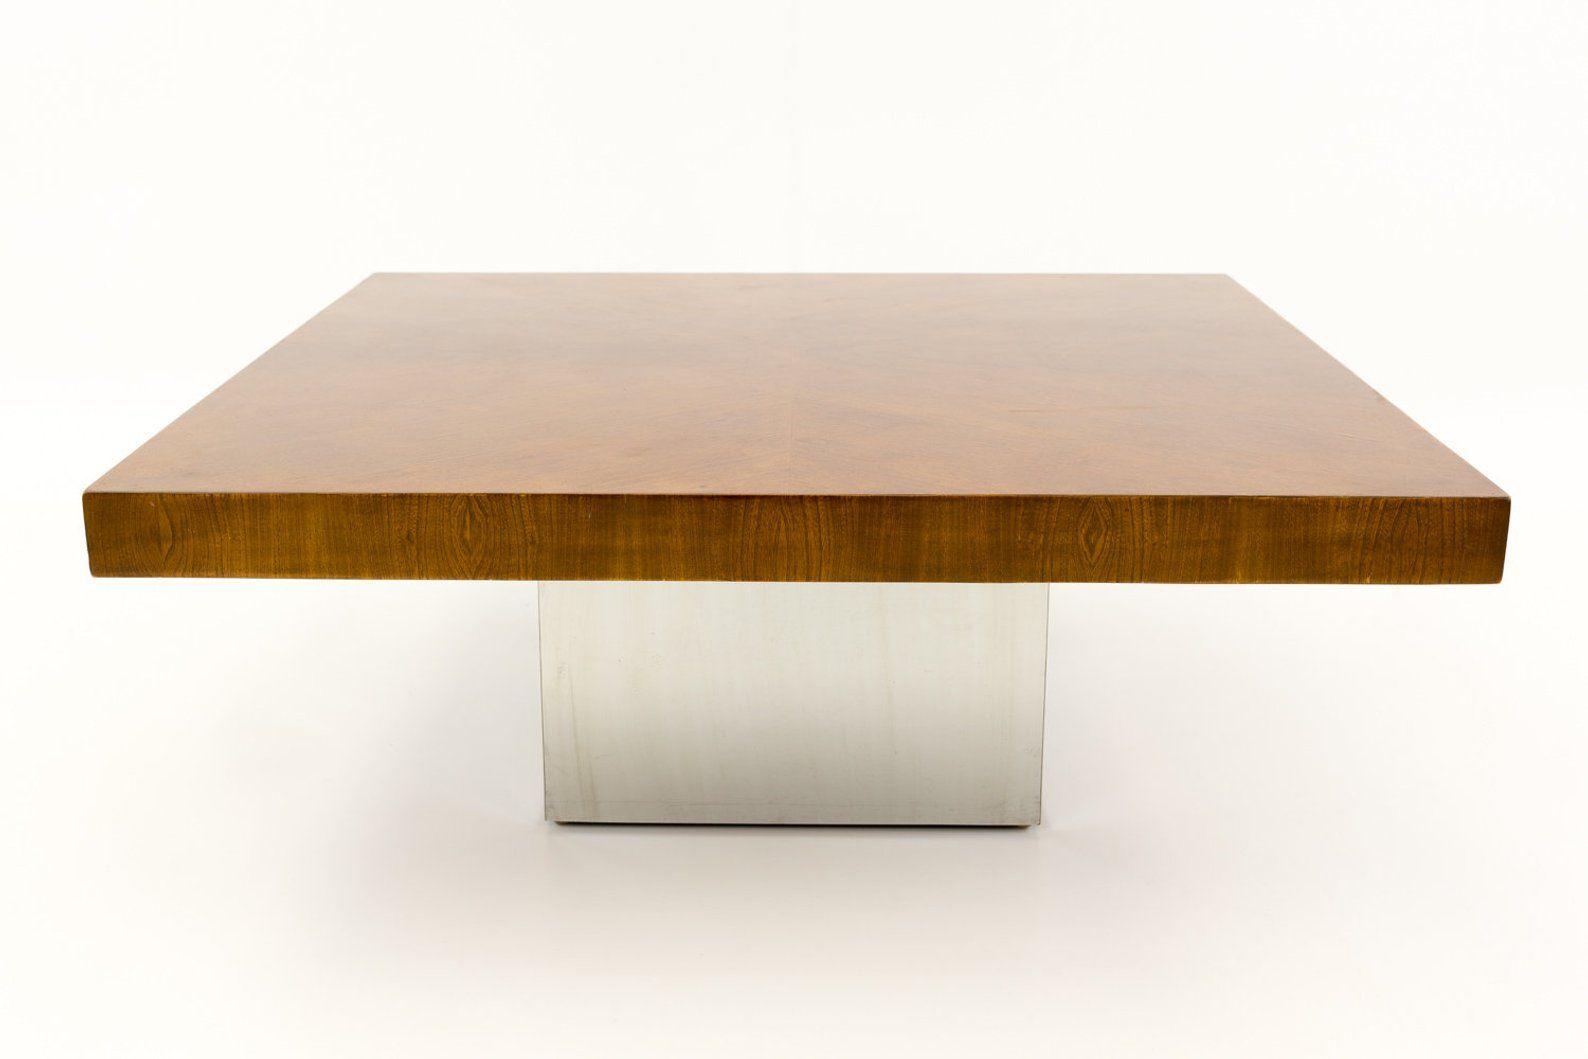 Milo Baughman Style Mid Century Modern Coffee Table Mcm Etsy Mid Century Modern Coffee Table Modern Coffee Tables Coffee Table [ 1059 x 1588 Pixel ]